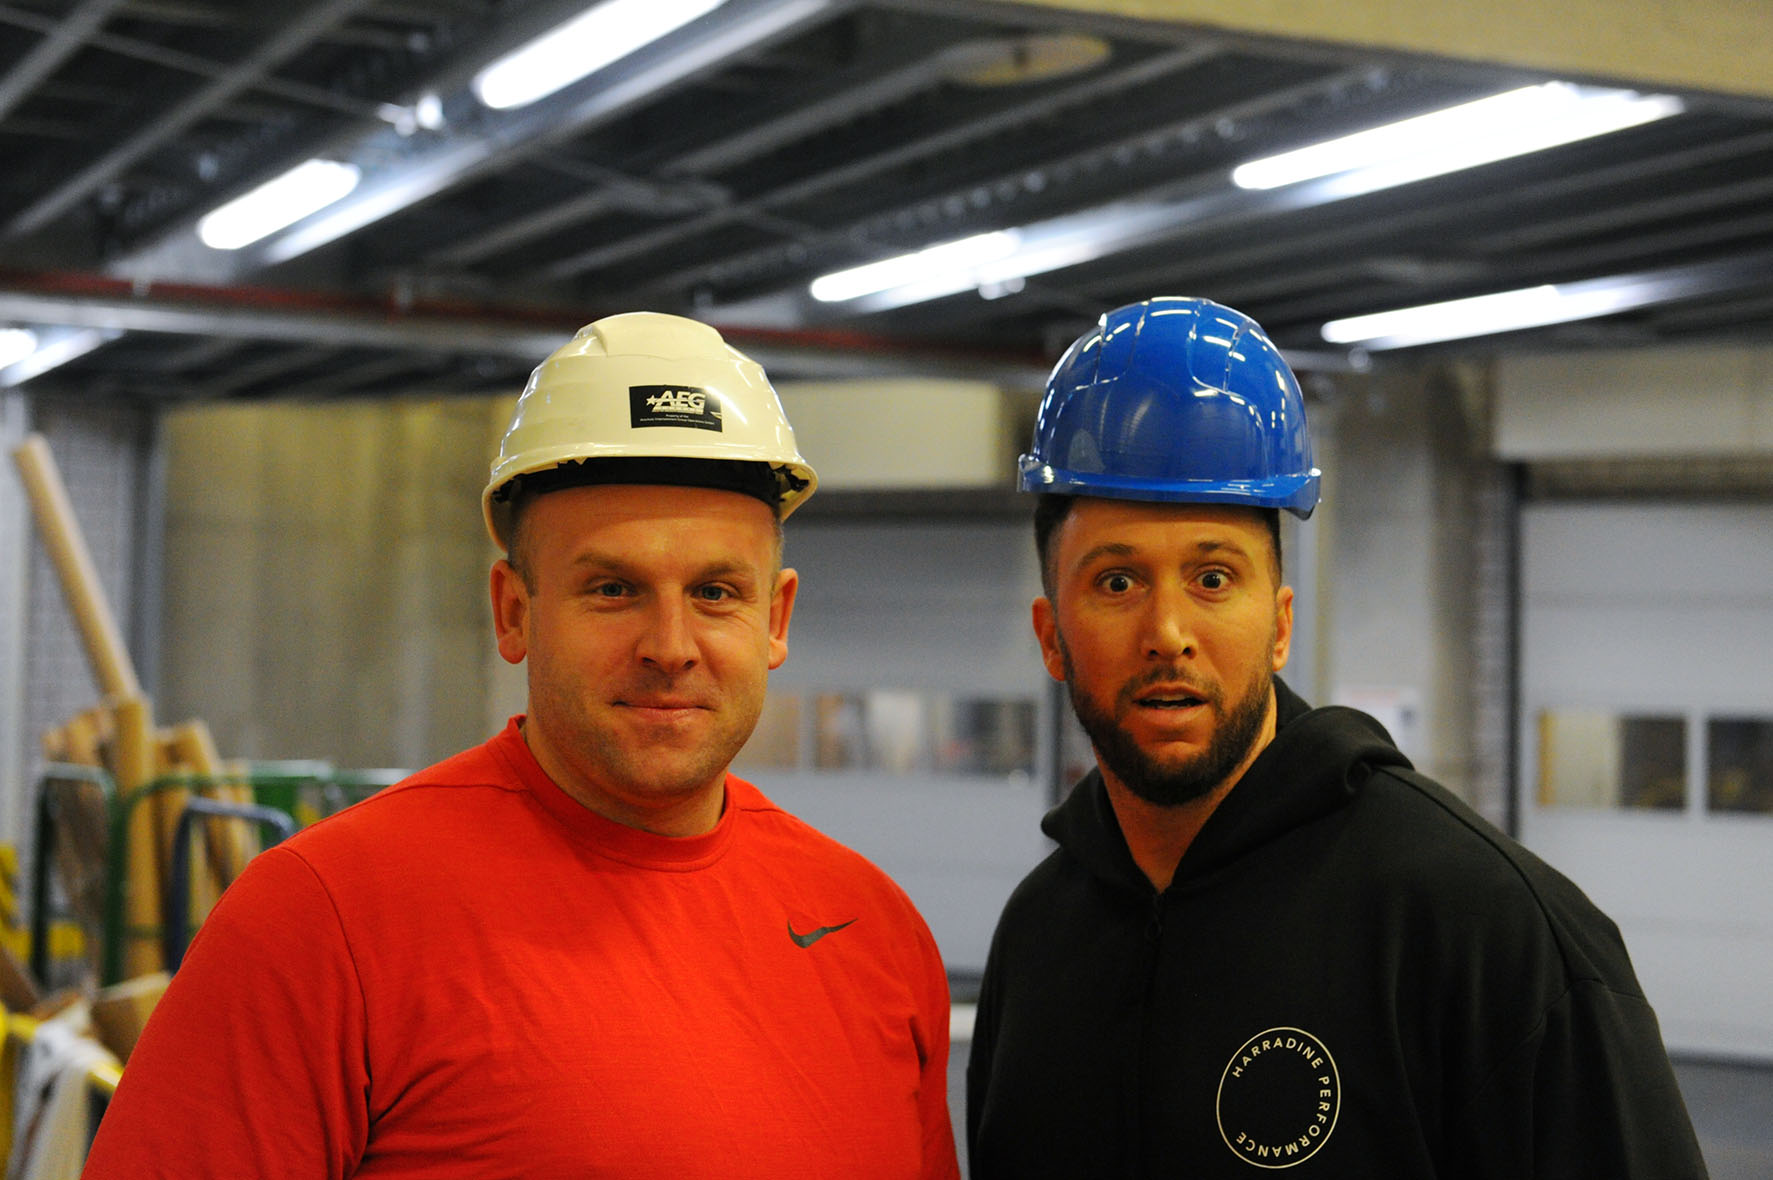 Piotr Malachowski & Benn Harradine